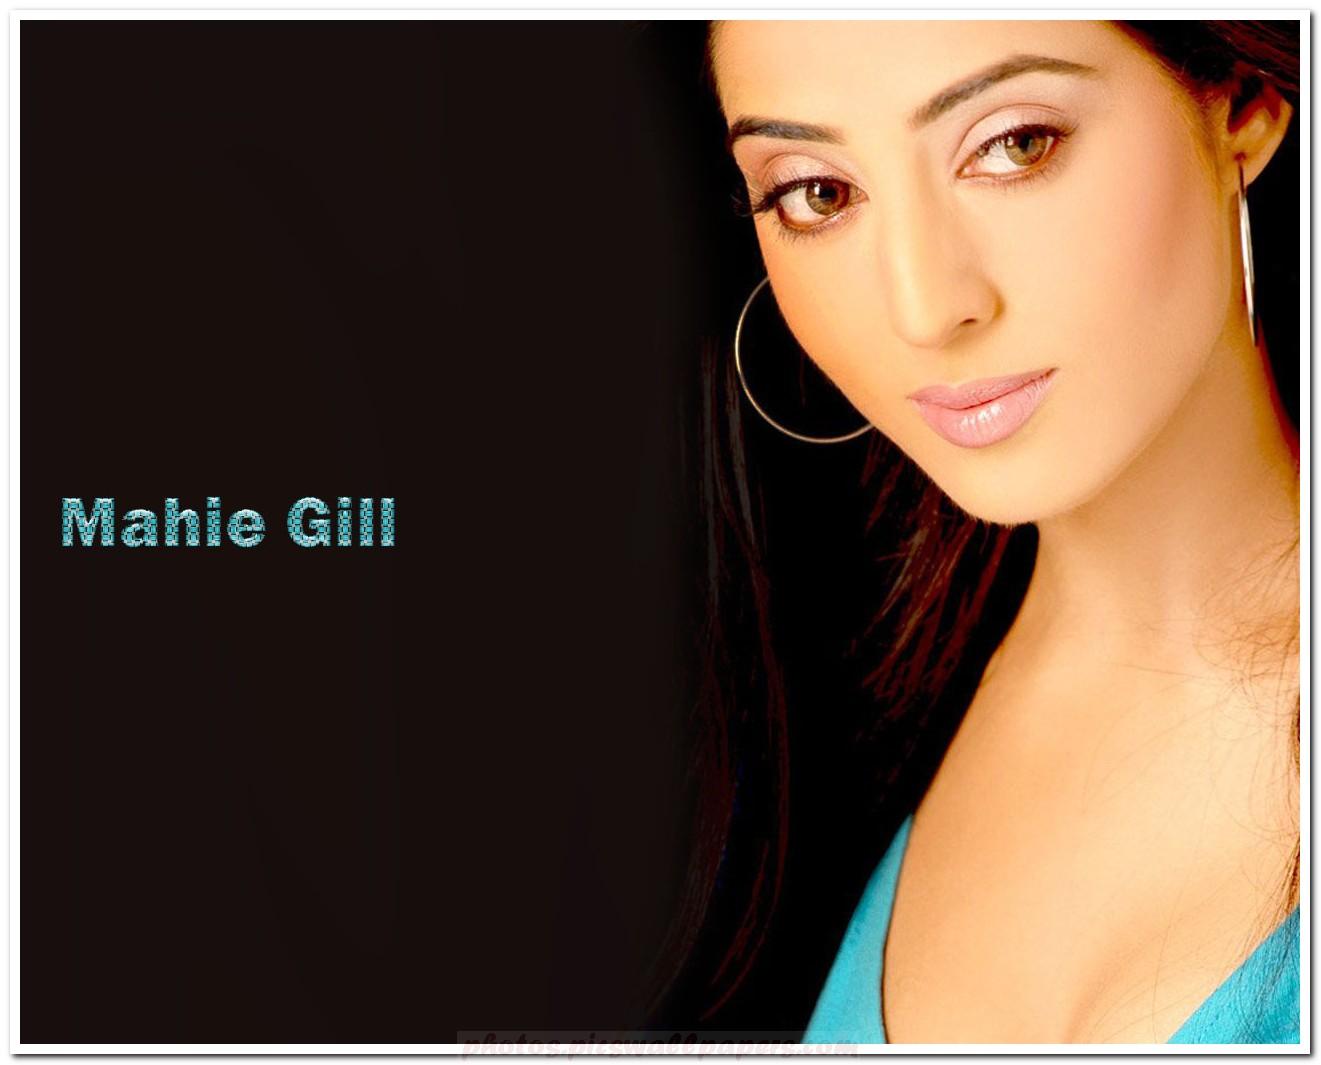 Mahi Gill